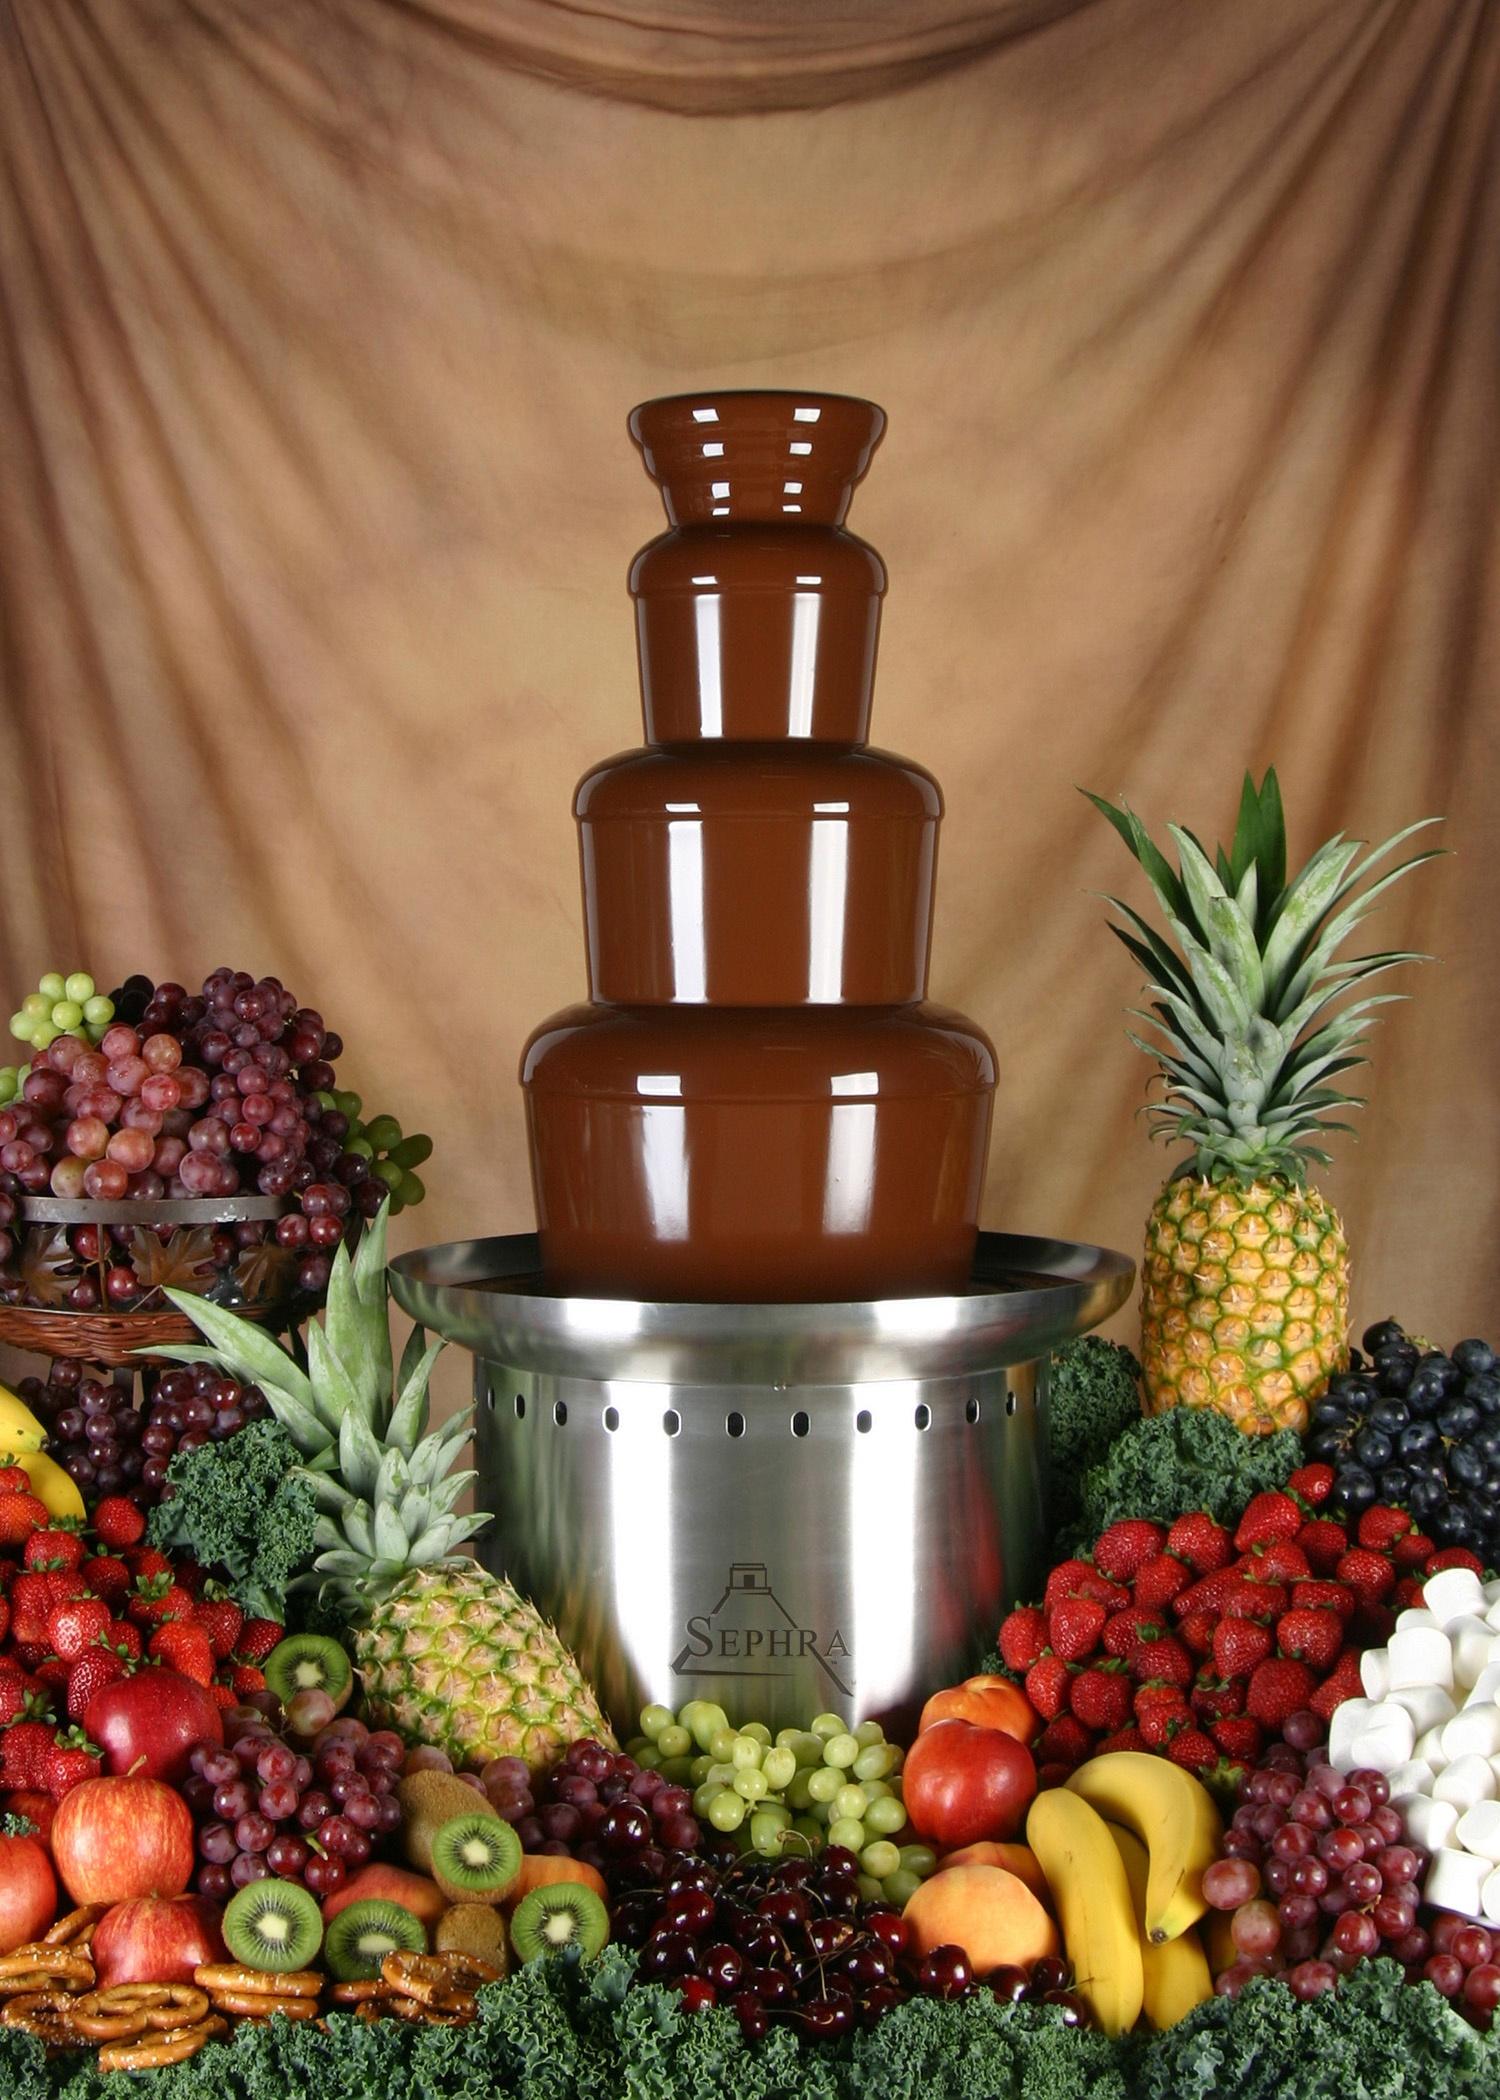 Sephra 10150 Aztec Chocolate Fountain 27 In 3 Tier